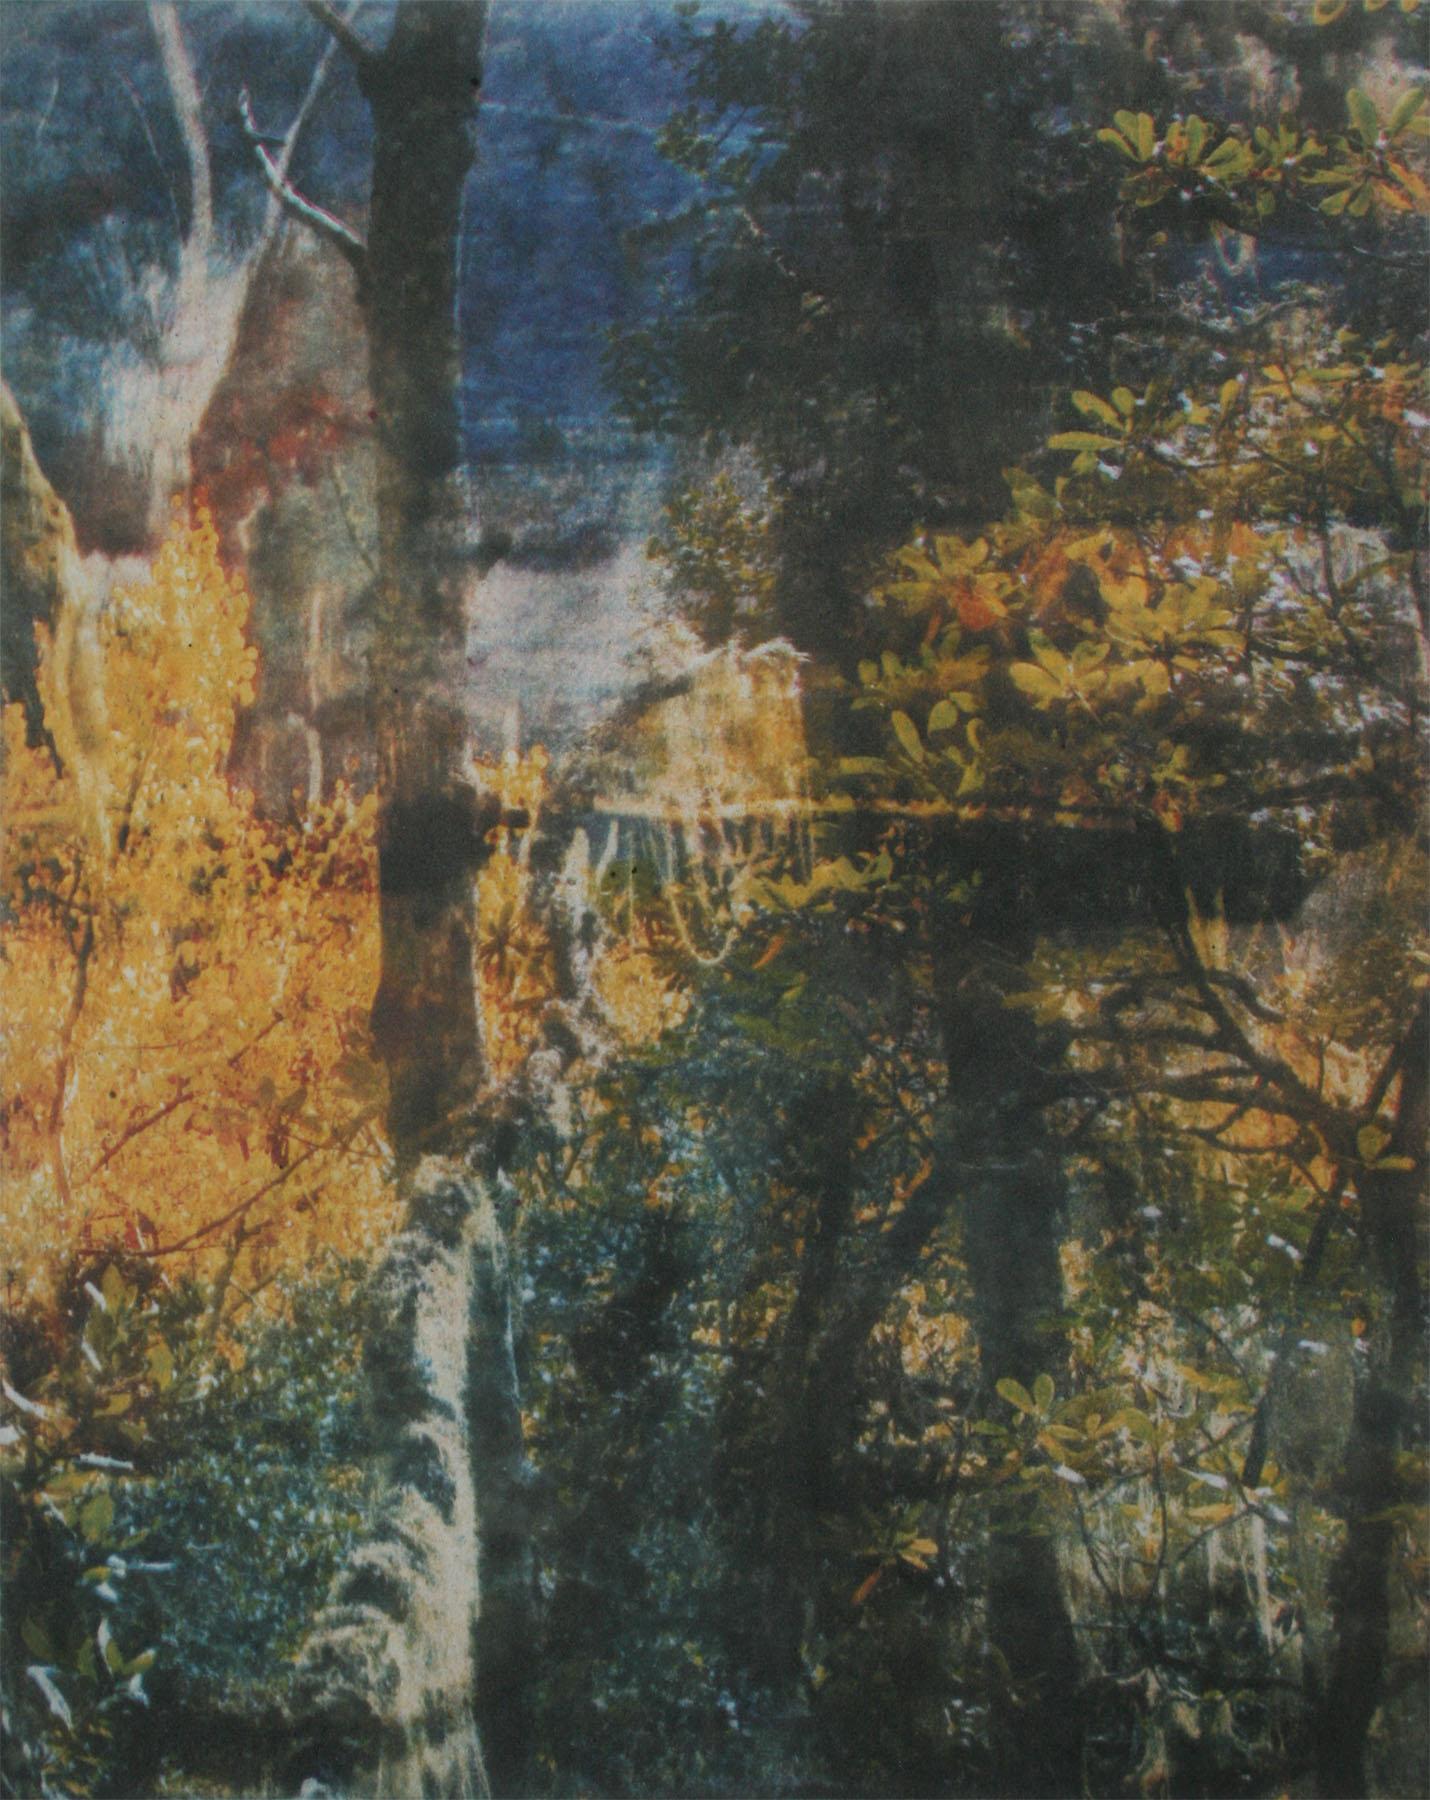 The Start of the Majestic World, Jessica Weybright